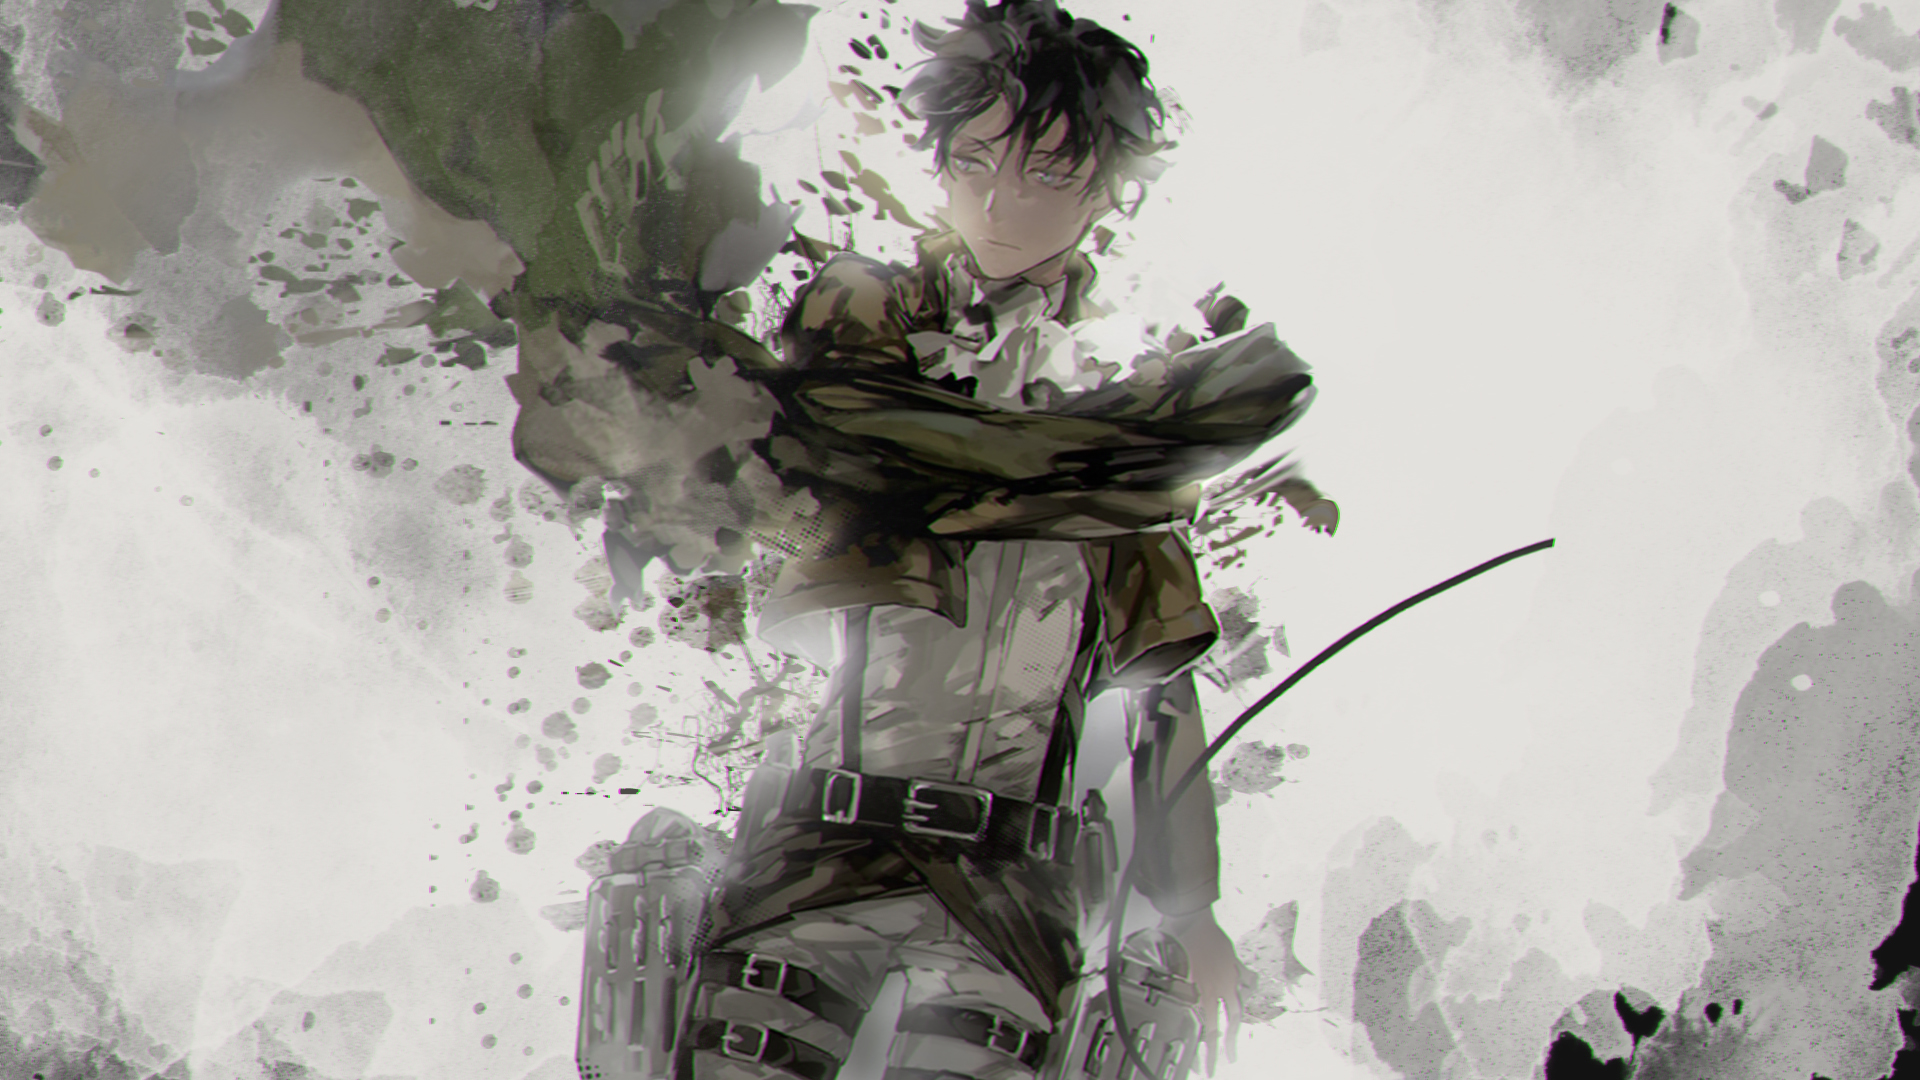 Attack On Titan Levi Ackerman Shingeki No Kyojin 1920x1080